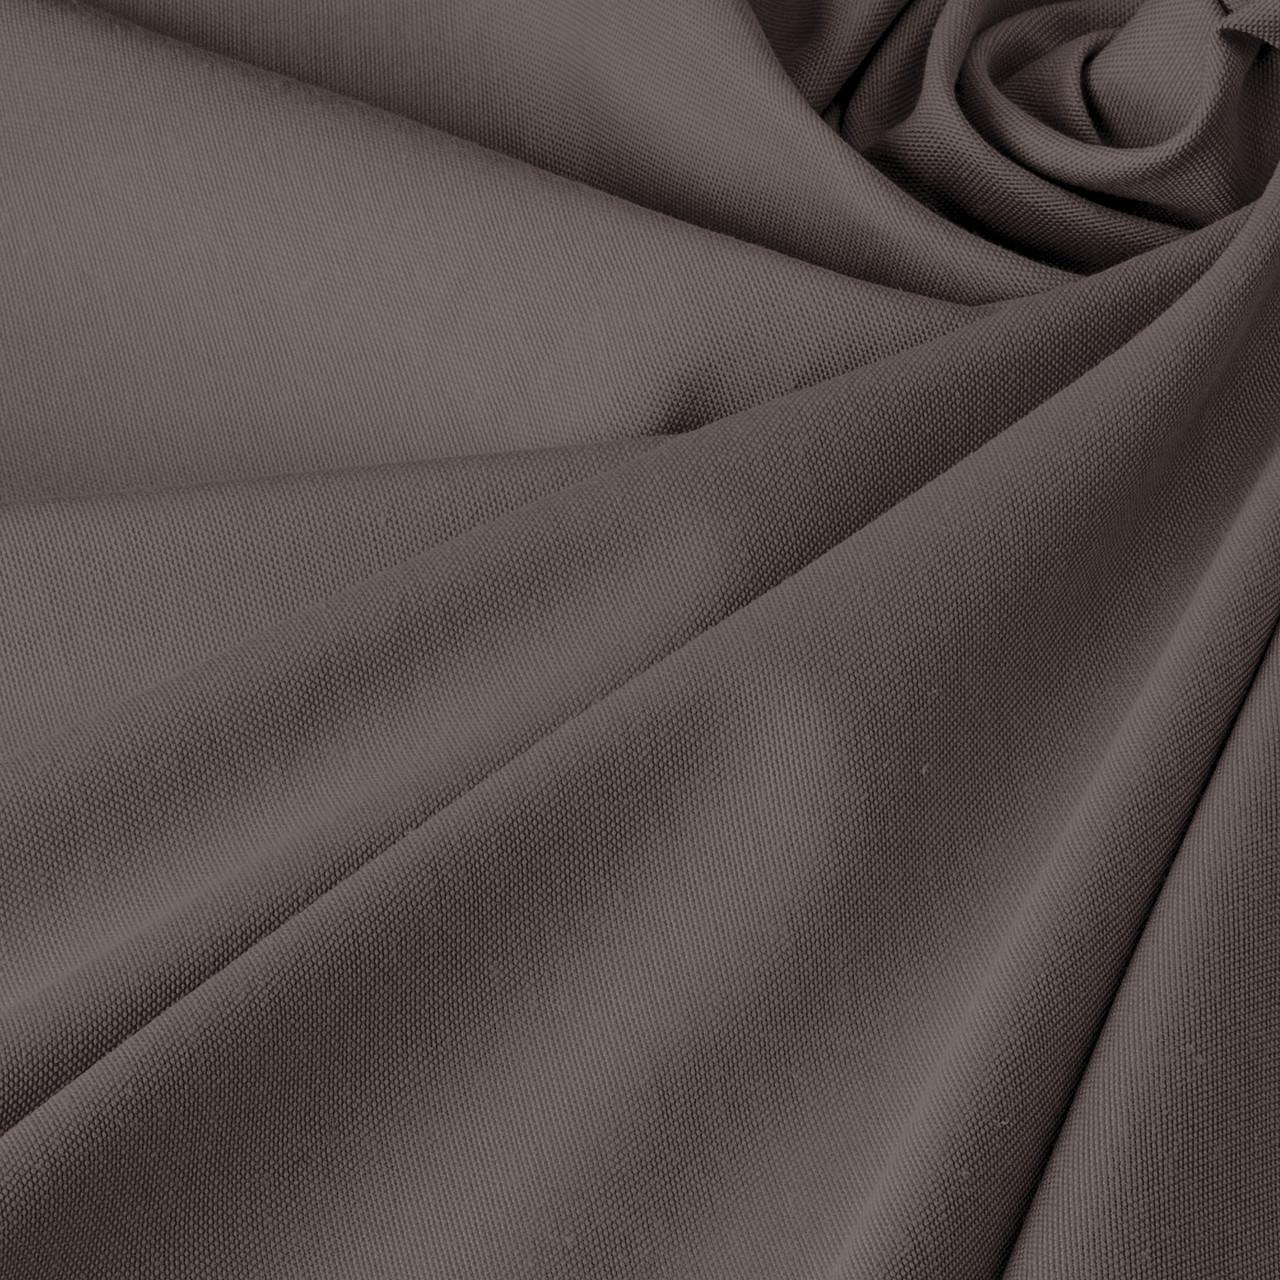 Однотонная декоративная ткань серого цвета с тефлоном Турция DRK-84591